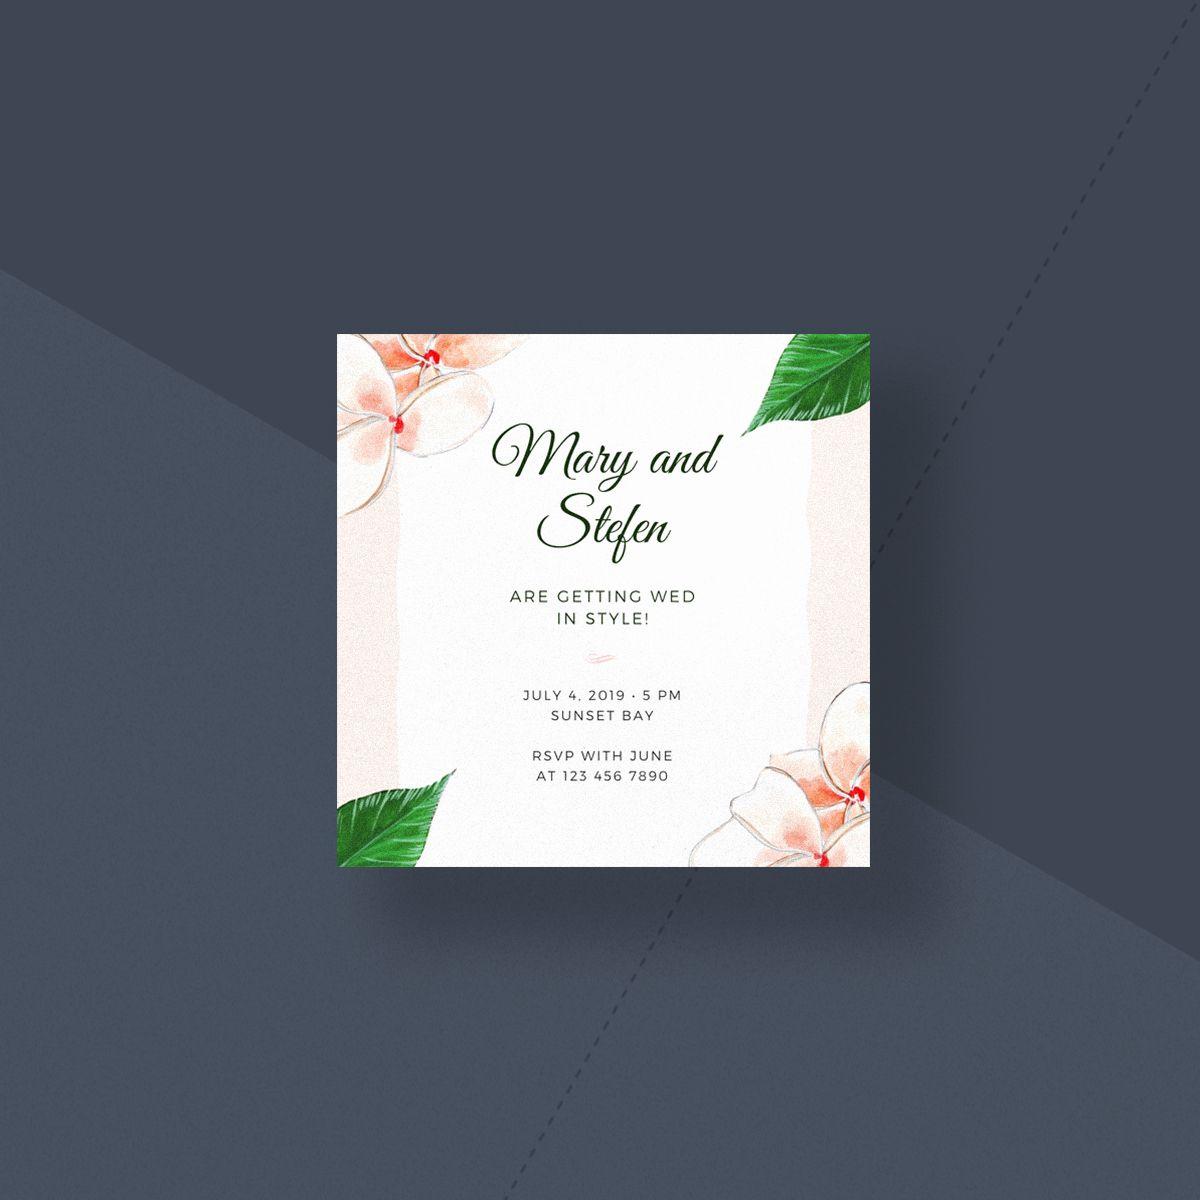 Wedding Invite Card Template Best Of Wedding Invitation Size Guide Canva S Design Wik Wedding Invitation Size Rsvp Wedding Cards Addressing Wedding Invitations